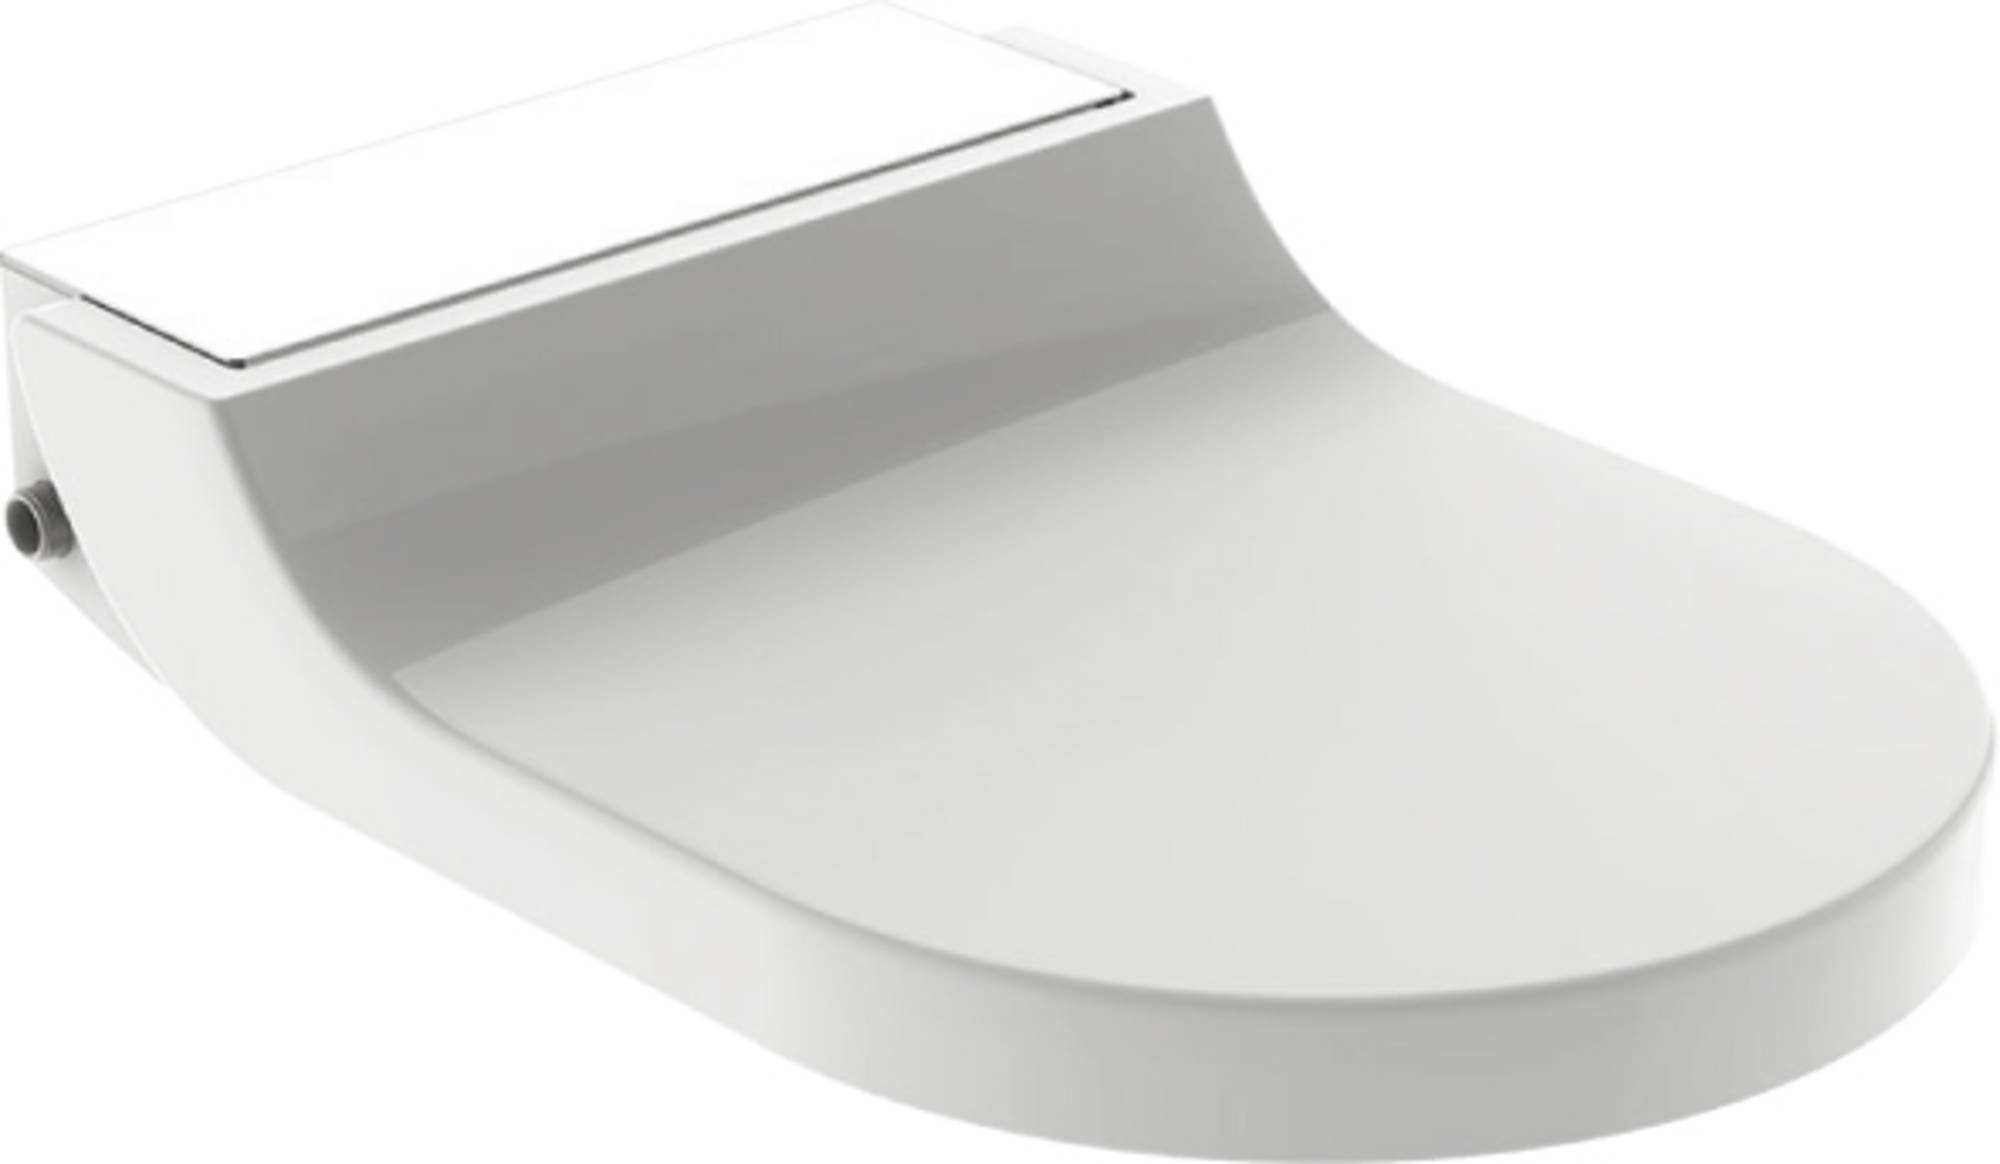 Productafbeelding van Geberit AquaClean closetzitting Tuma Comfort decorplaat Wit glas